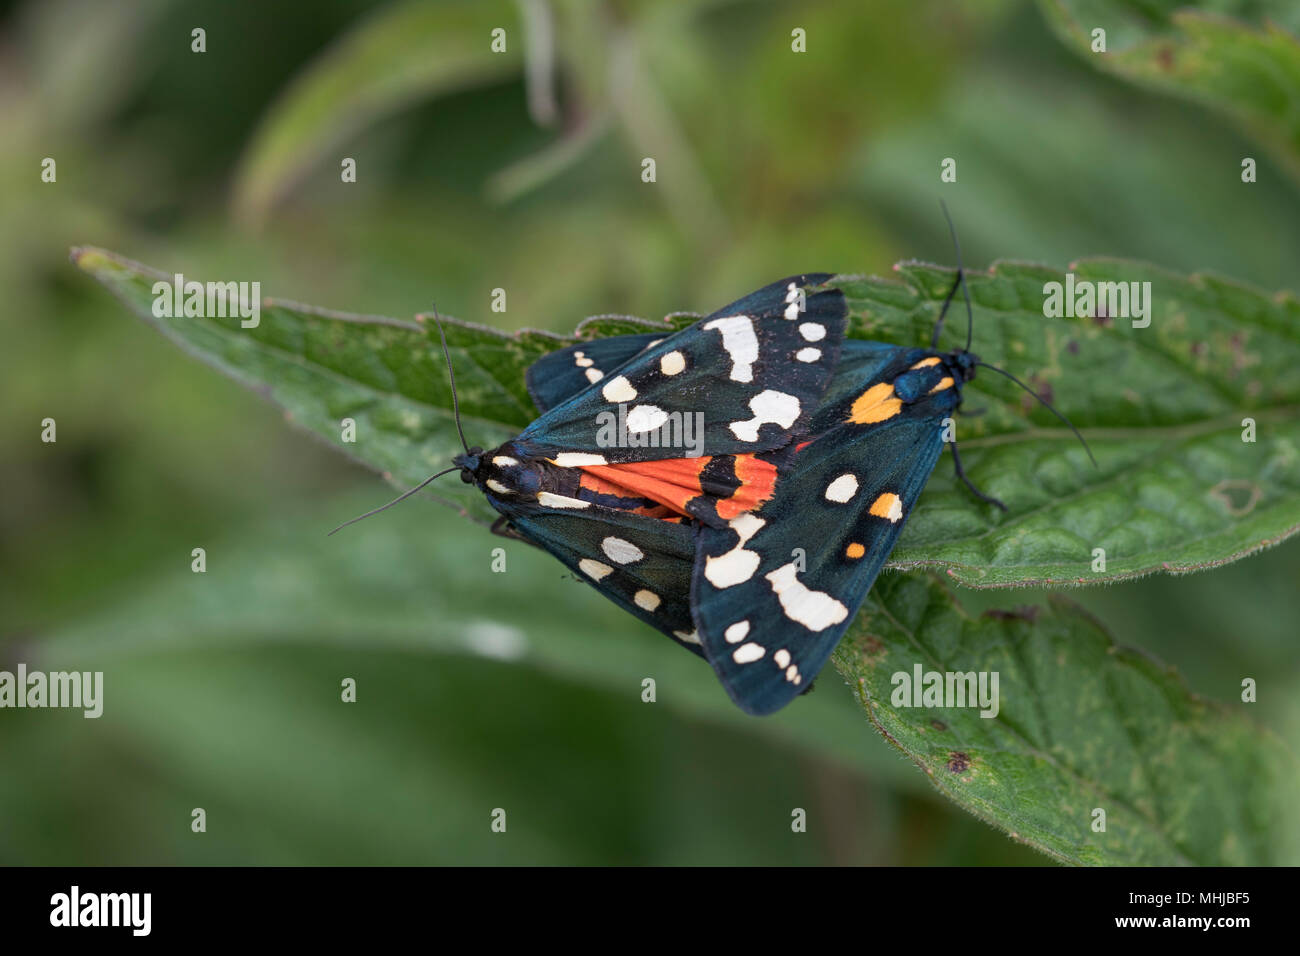 Scarlet Tiger Moth; Callimorpha dominula Pair Mating Cornwall; UK - Stock Image